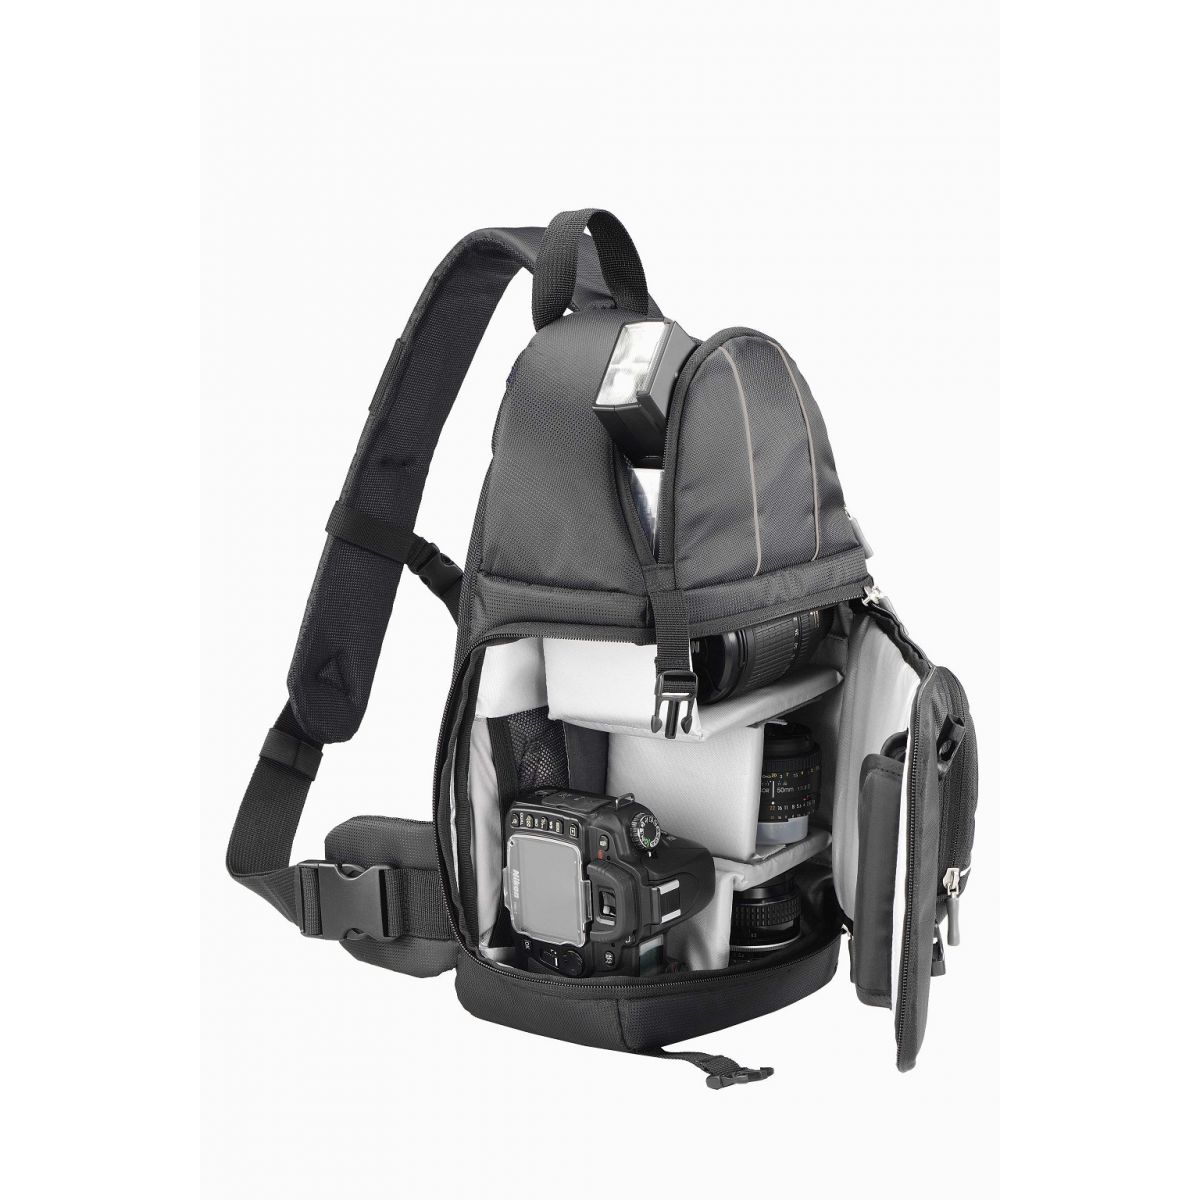 Mochila para Câmera DSLR Xposure II Preta POC484BK - Sumdex